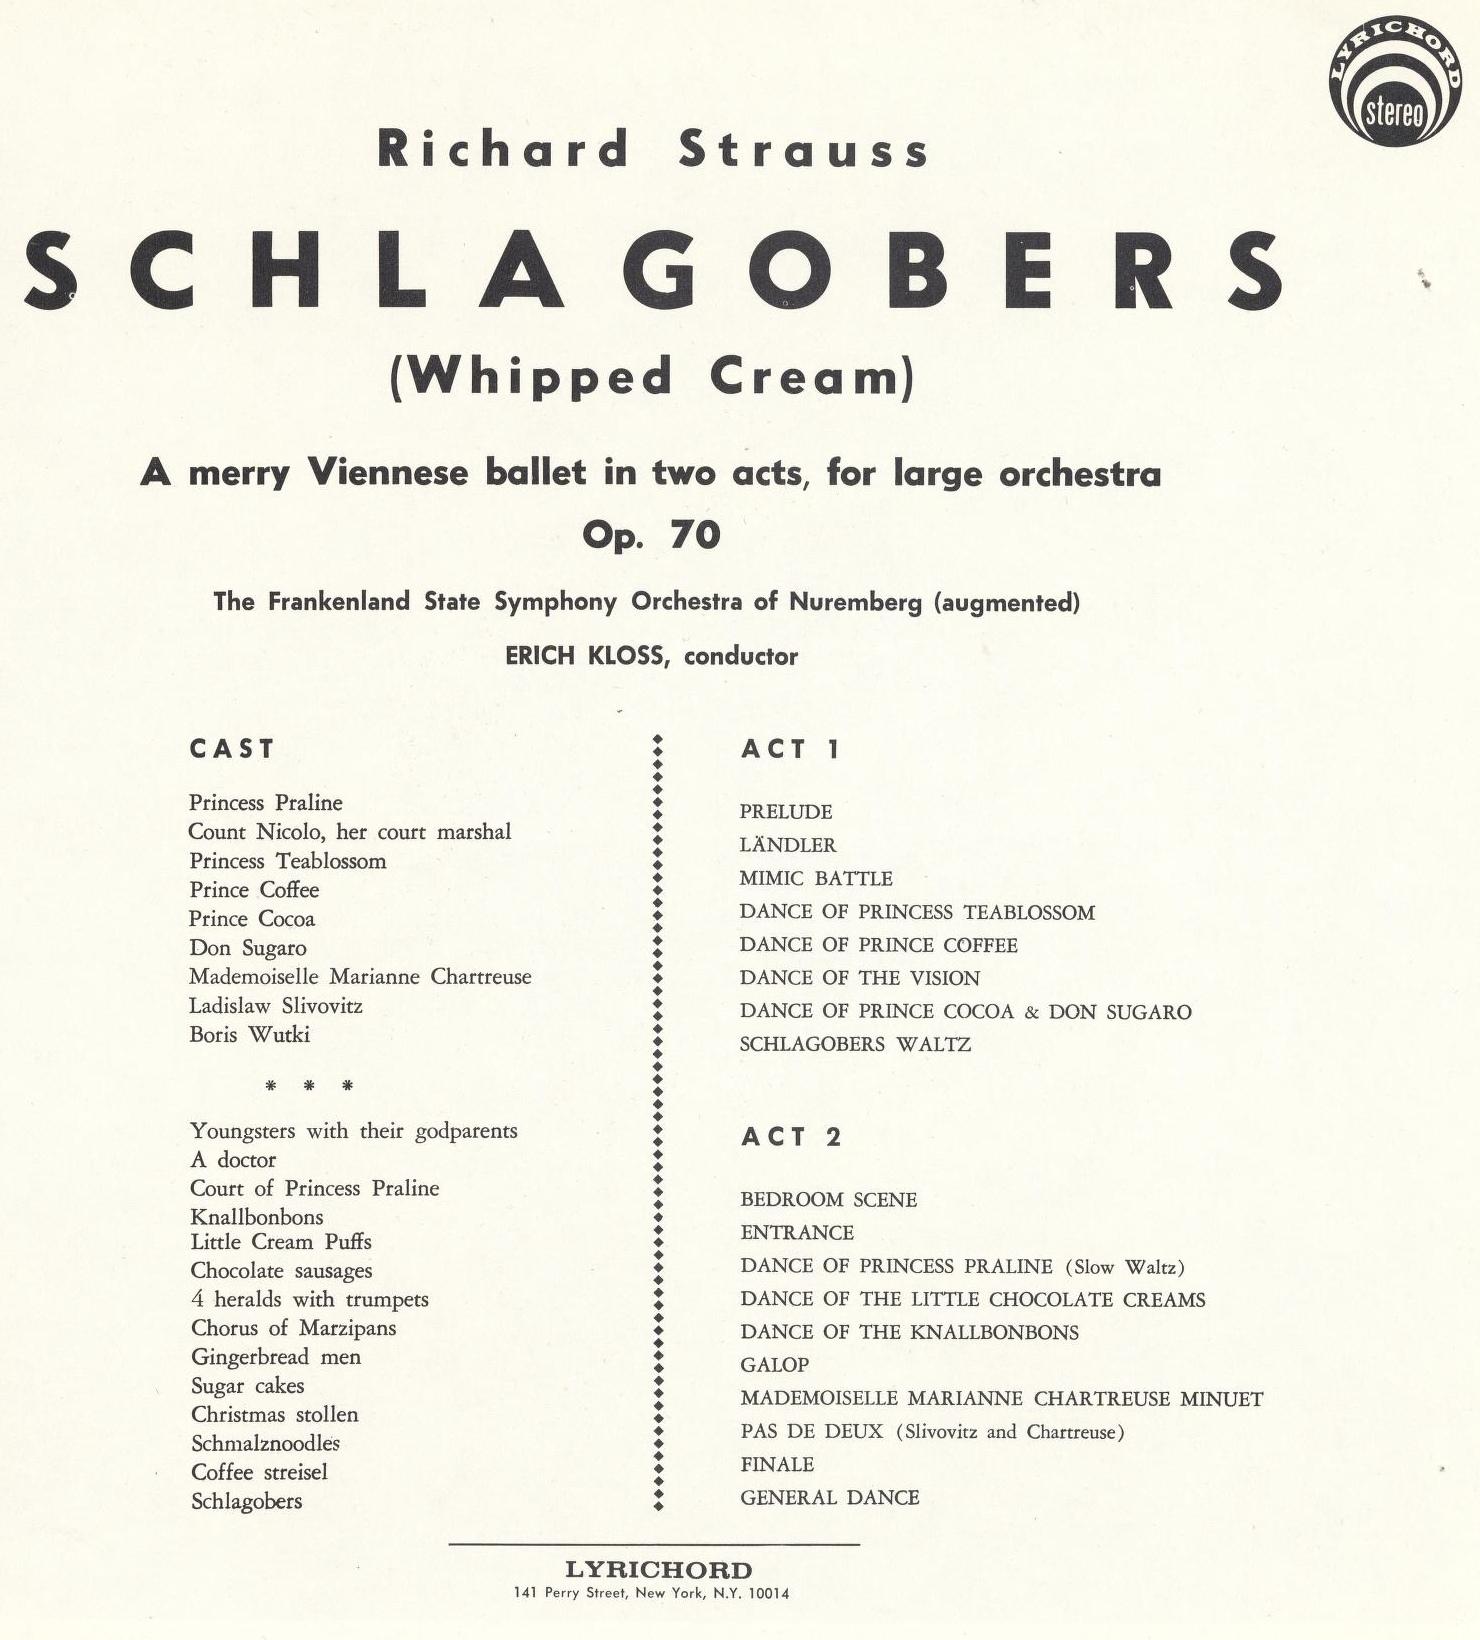 Insert de l'album Lyrichord Stéréo LLST 741